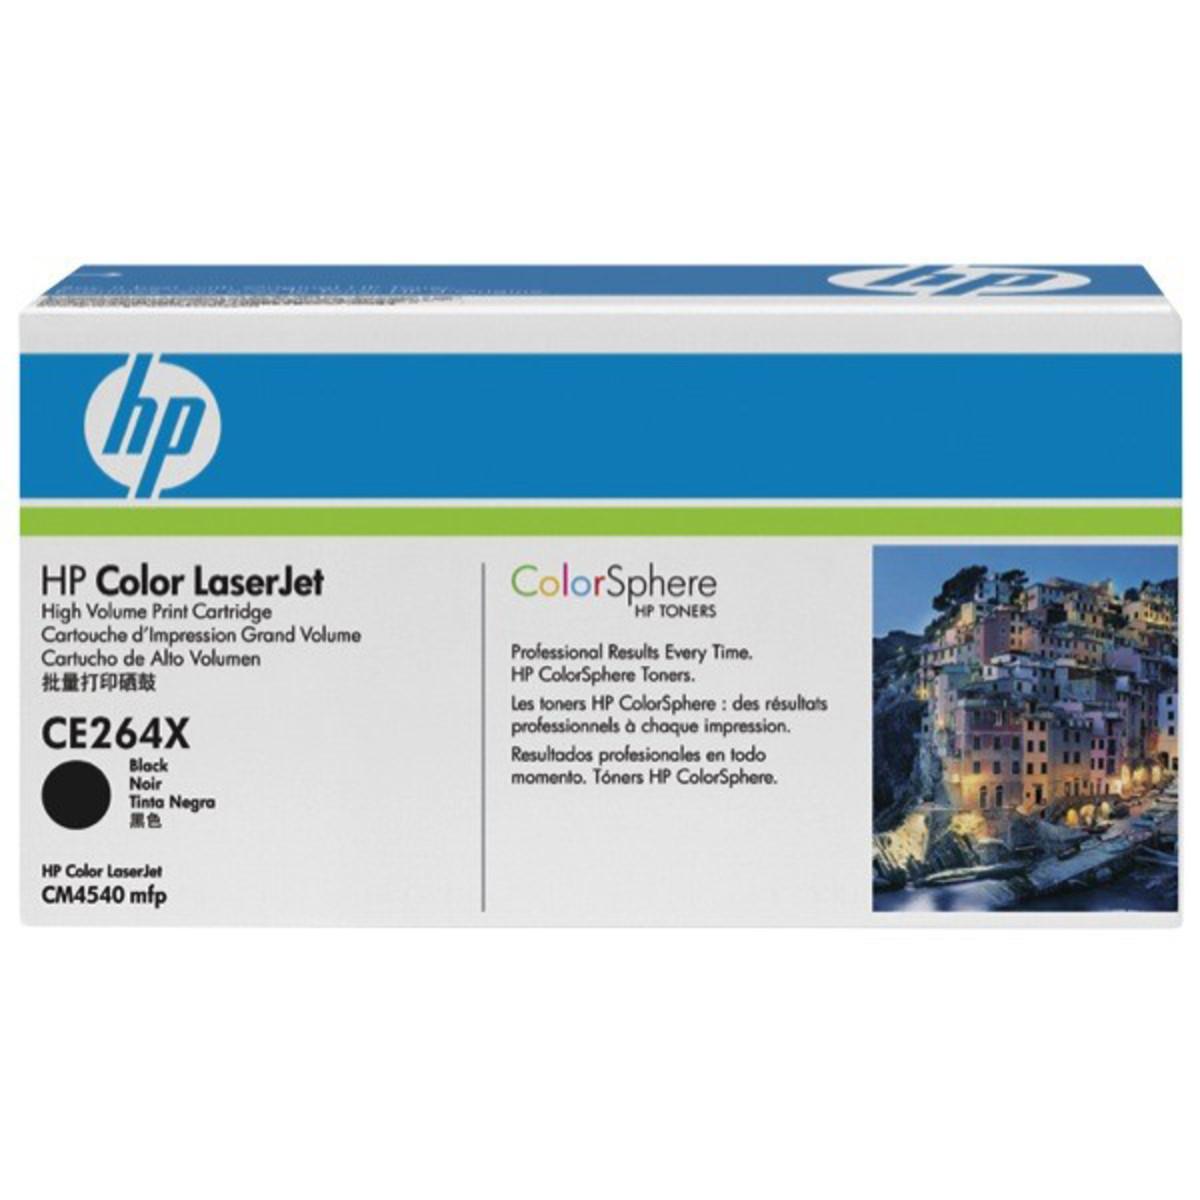 HP 646X (CE264X) Black Toner Cartridge - High Yield